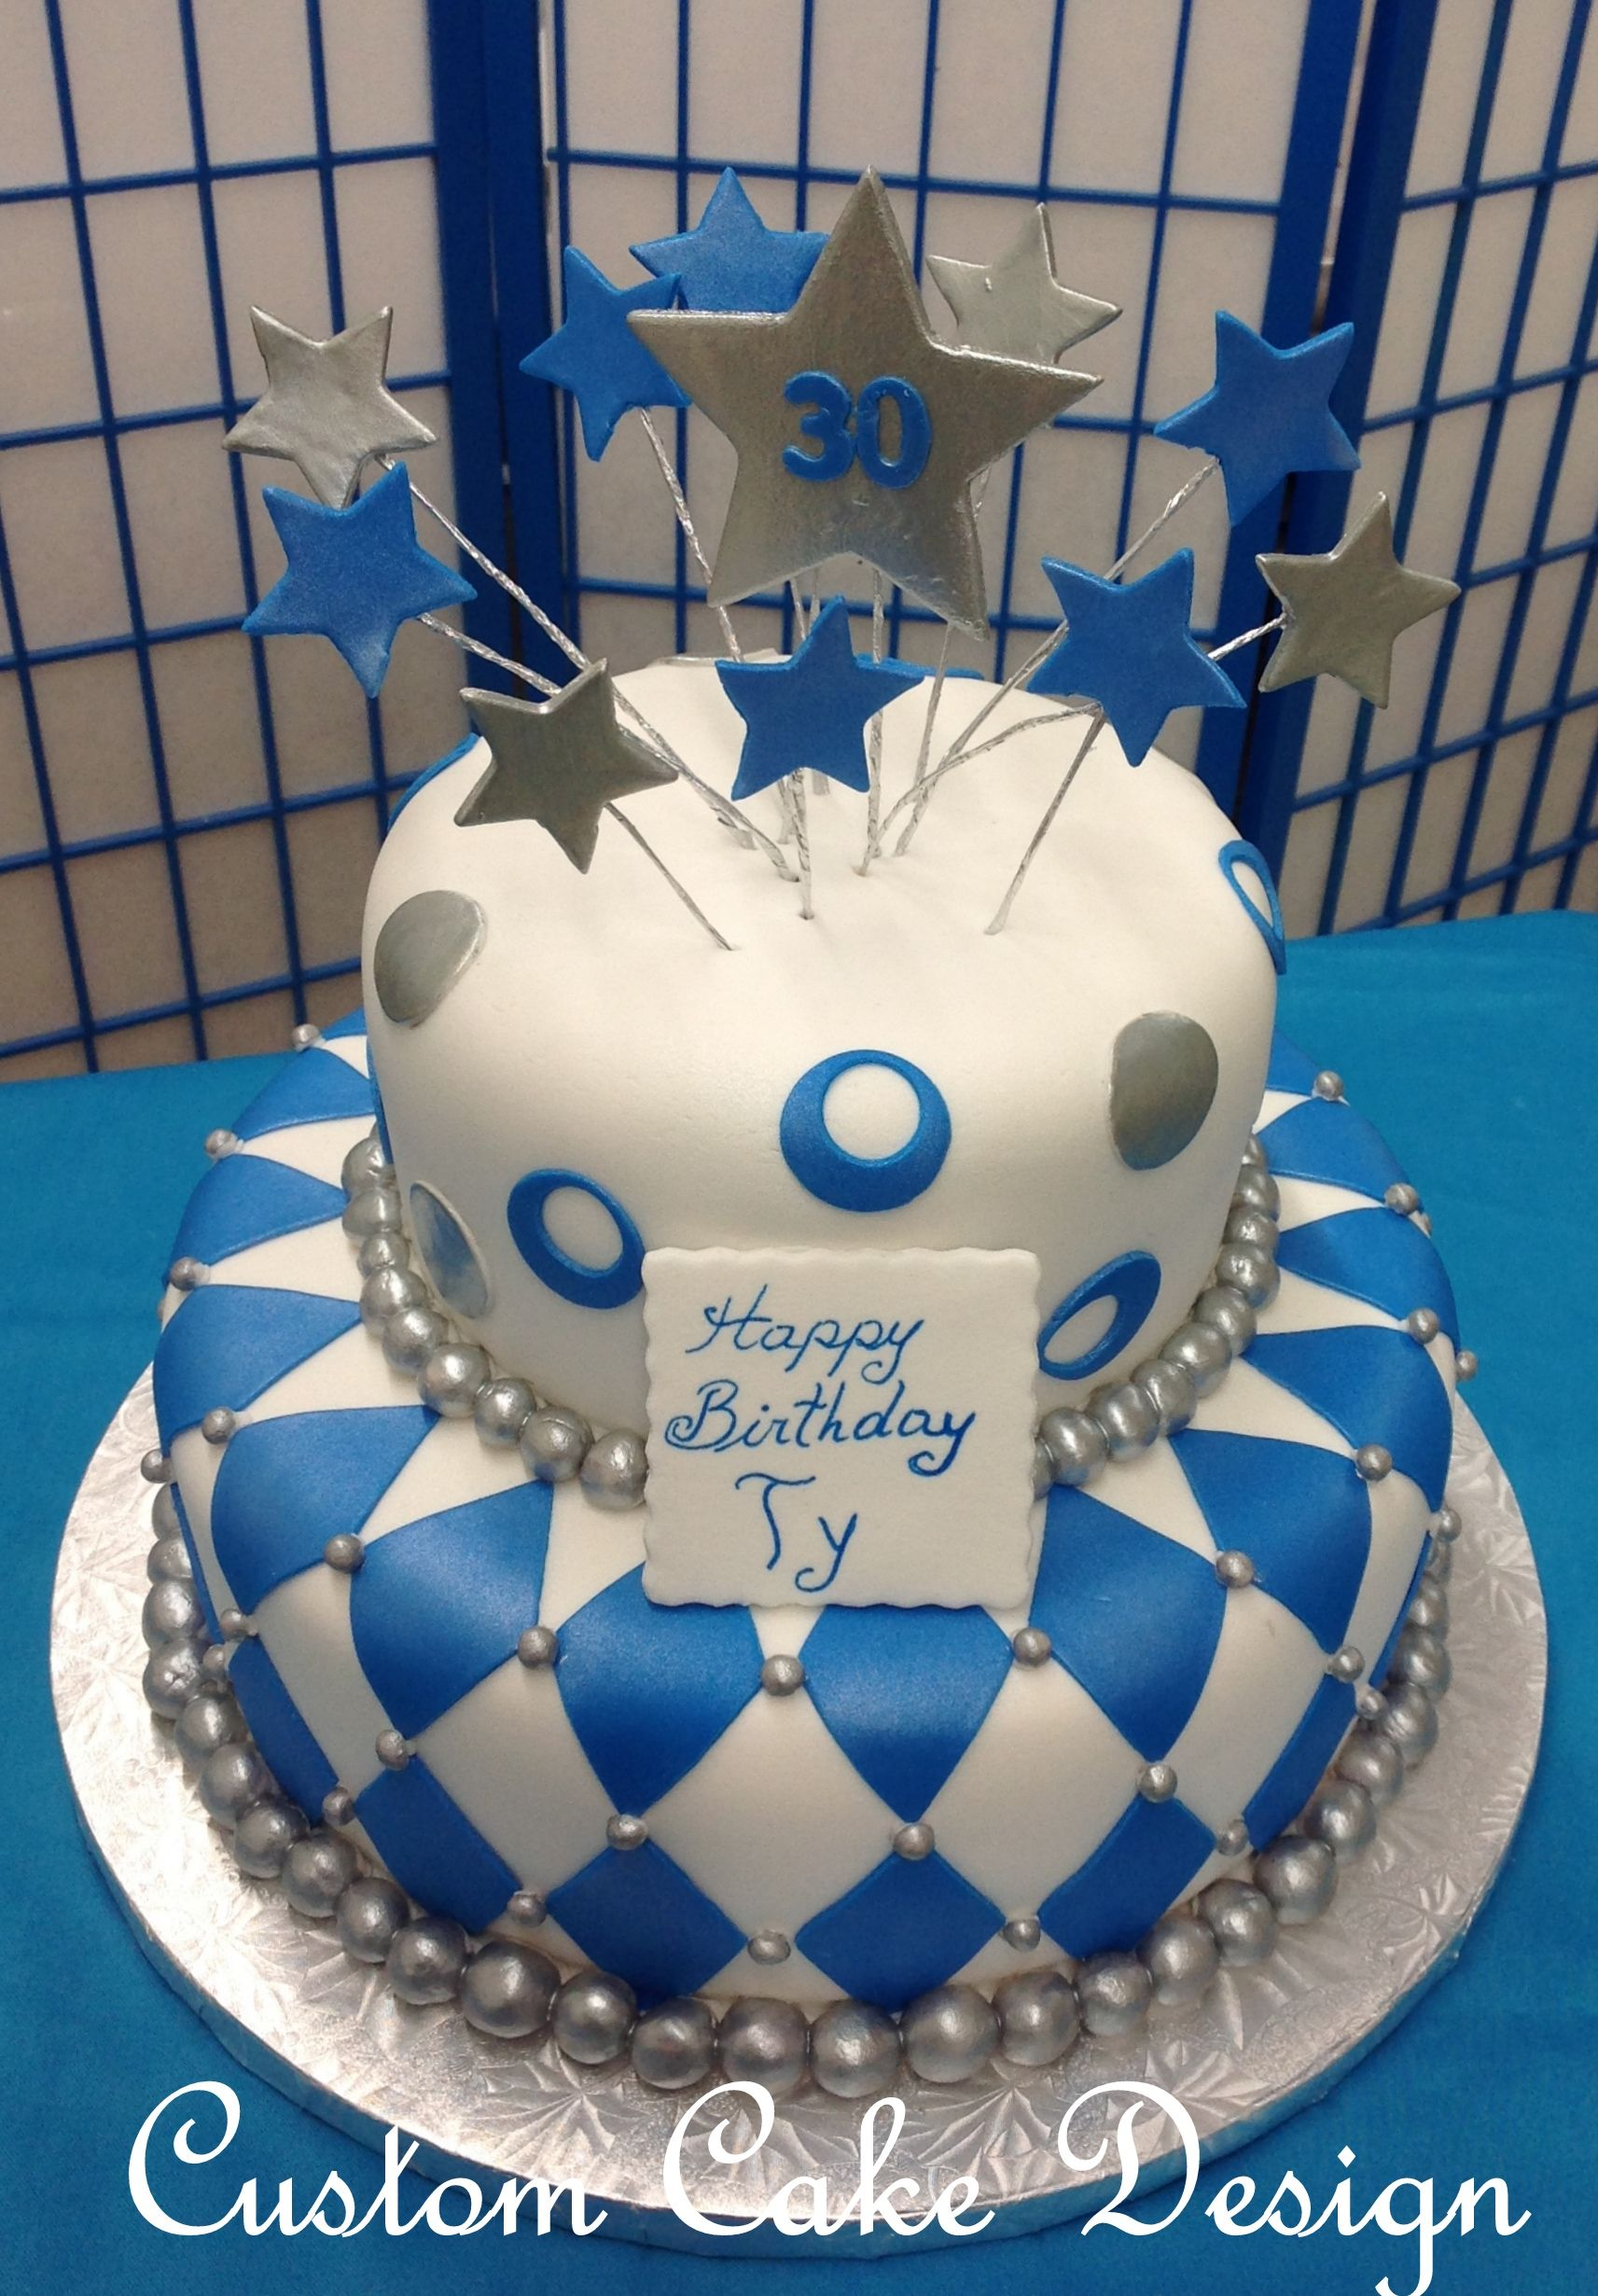 Custom Cake Adult birthday cakes, Cake, Cake design